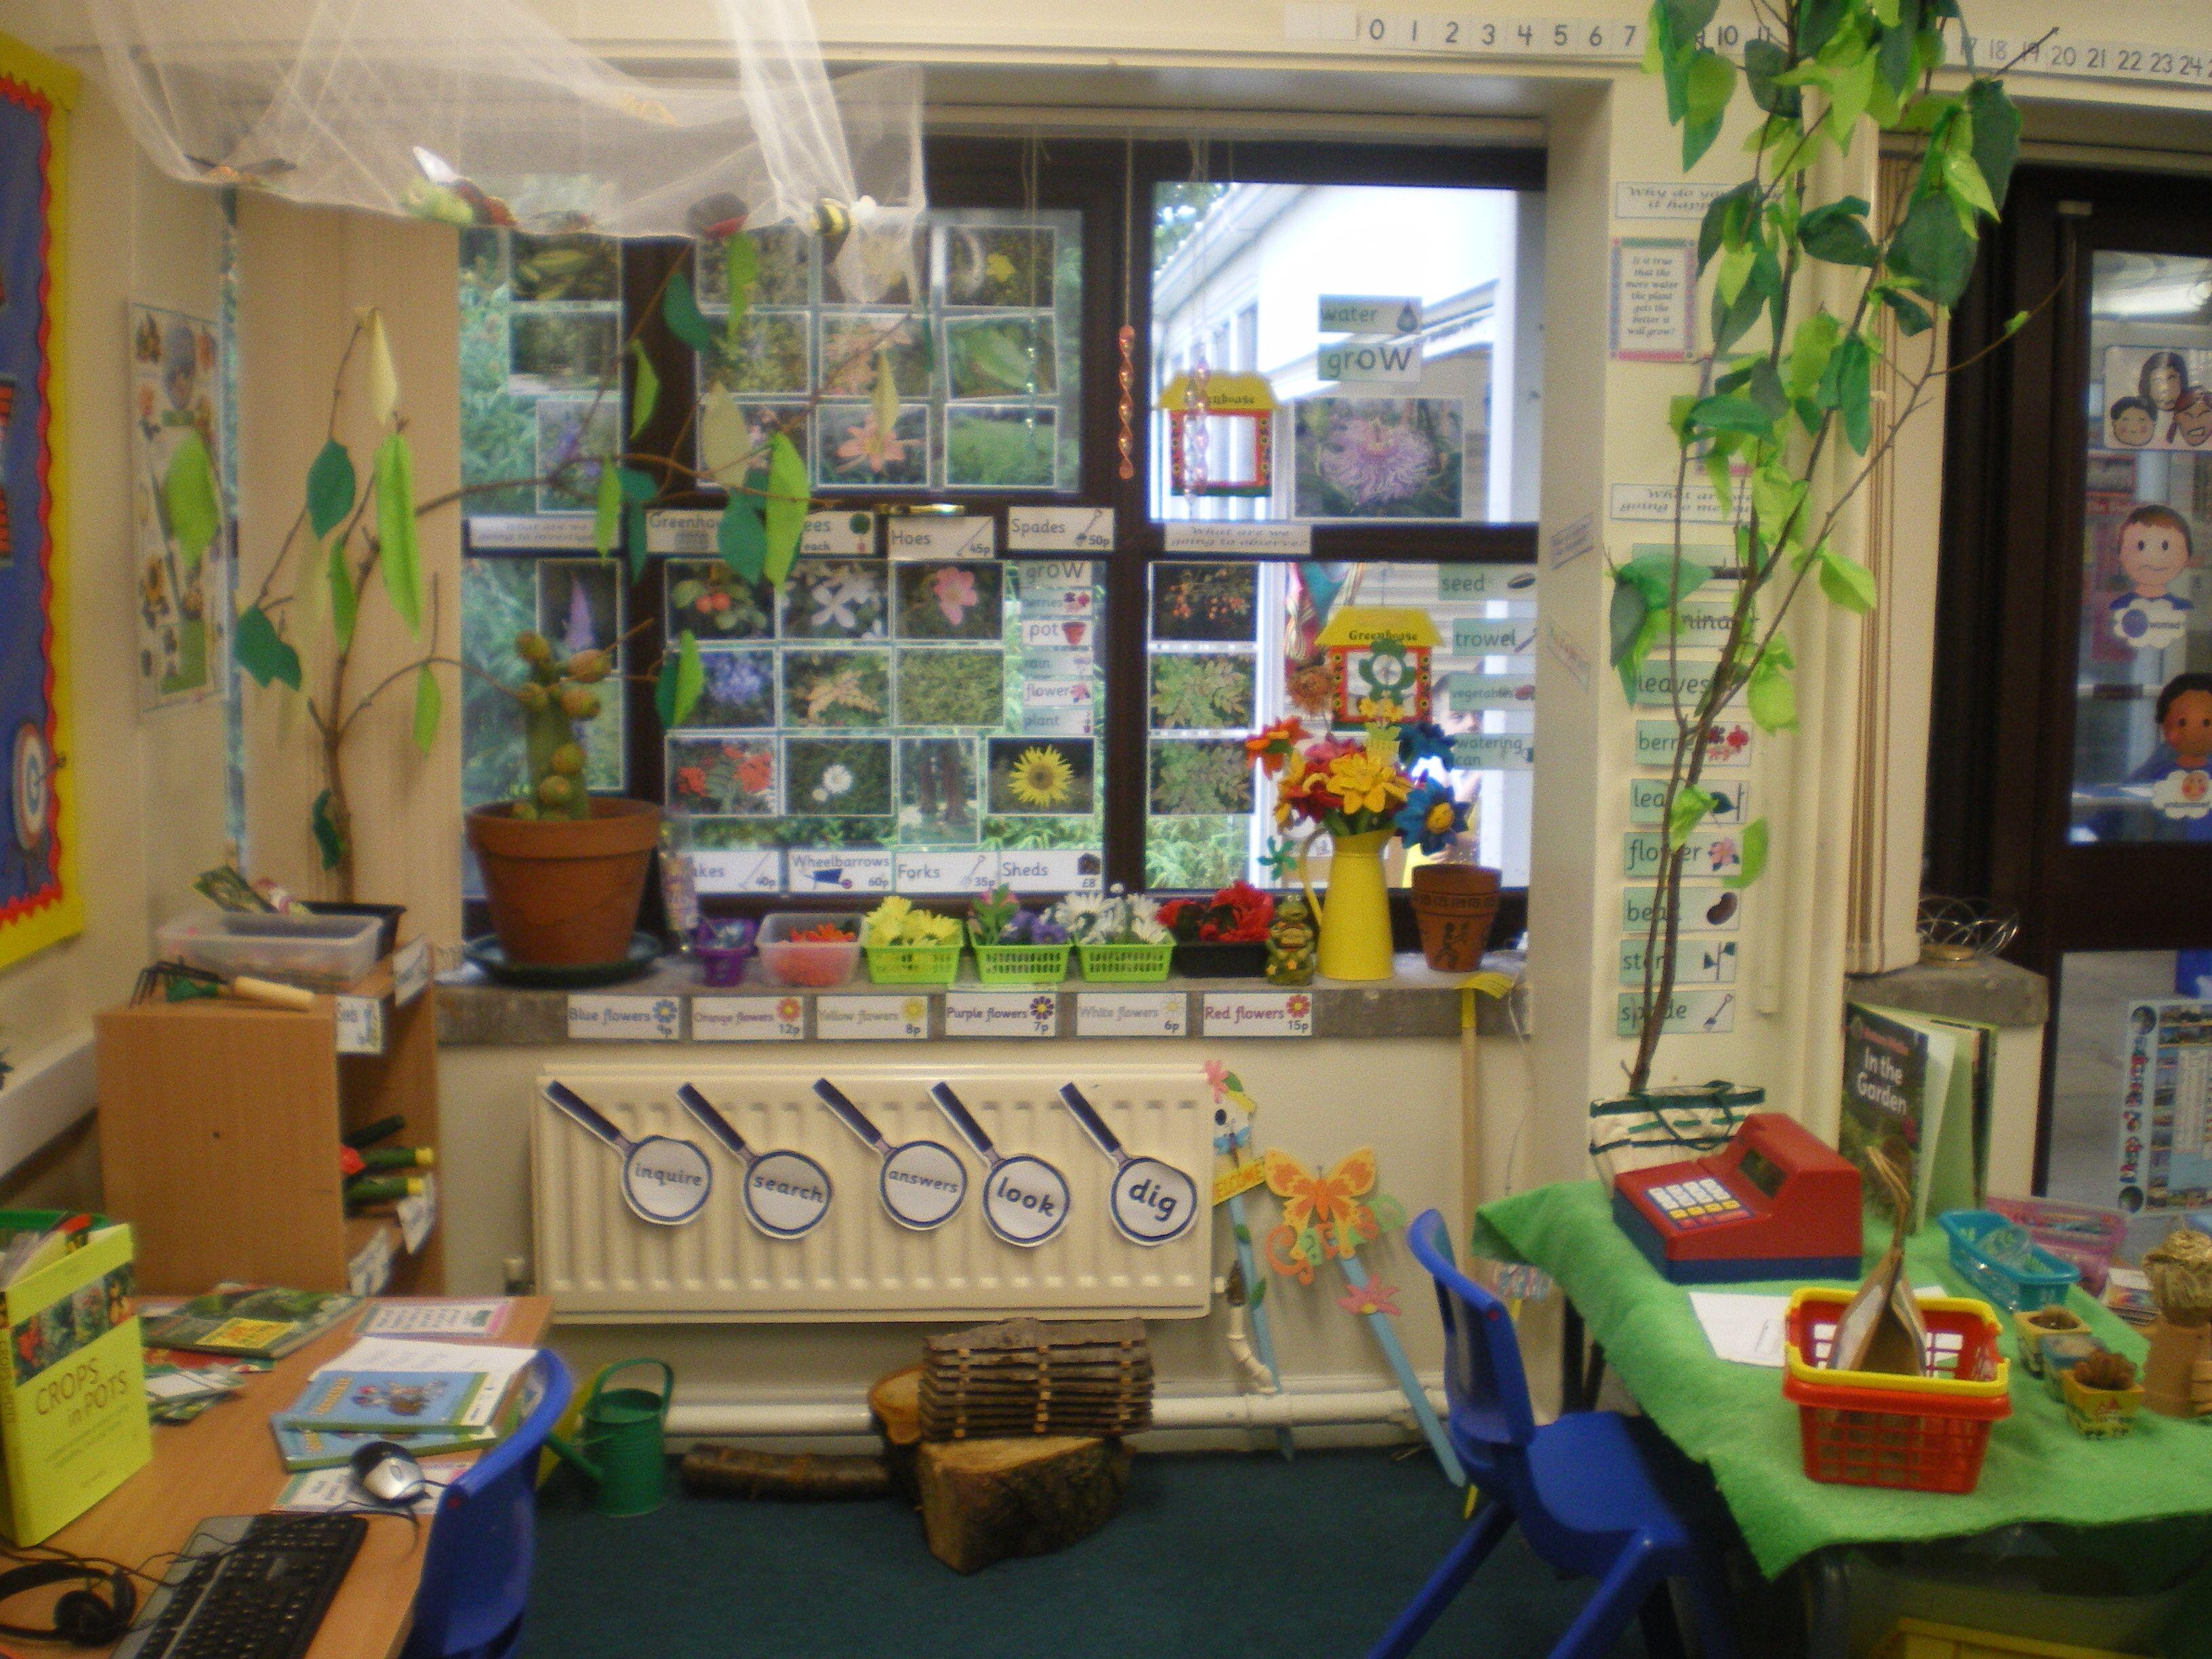 Garden Centre Role Play Ideas Love Reggio Inspired Spaces